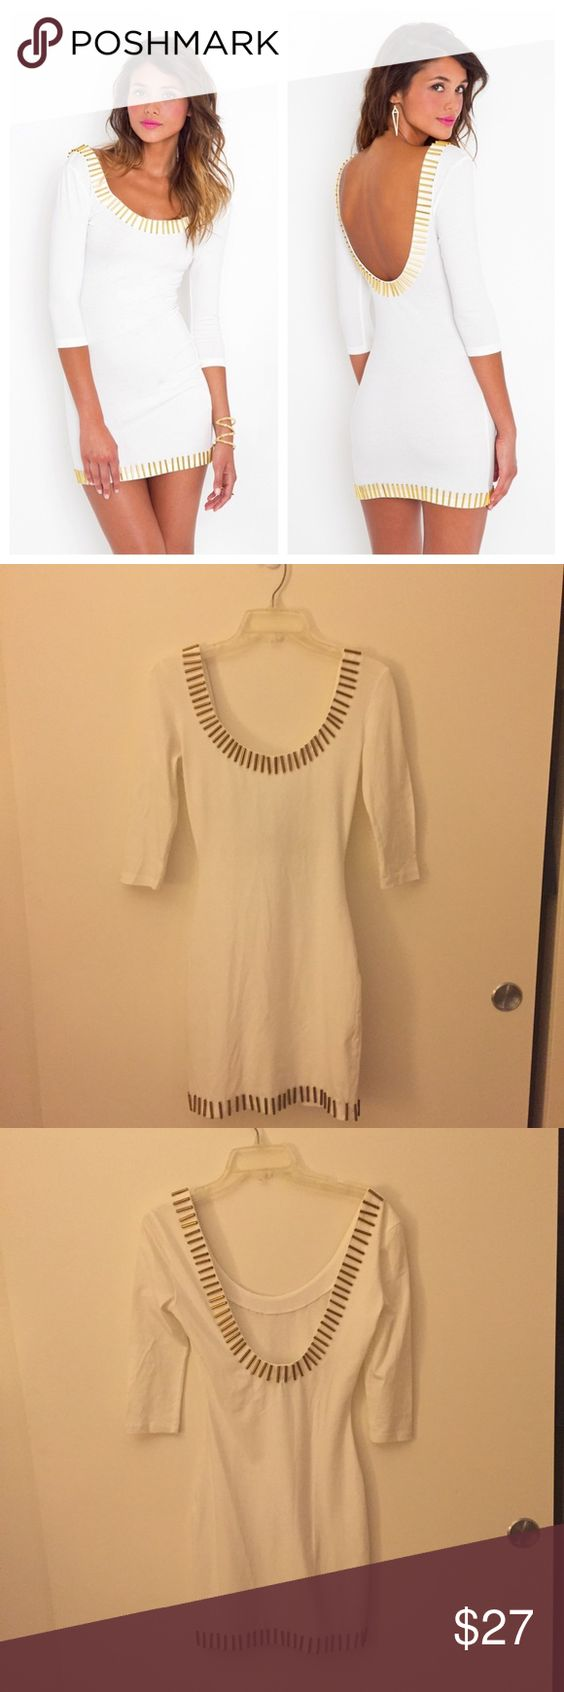 White rush dresses